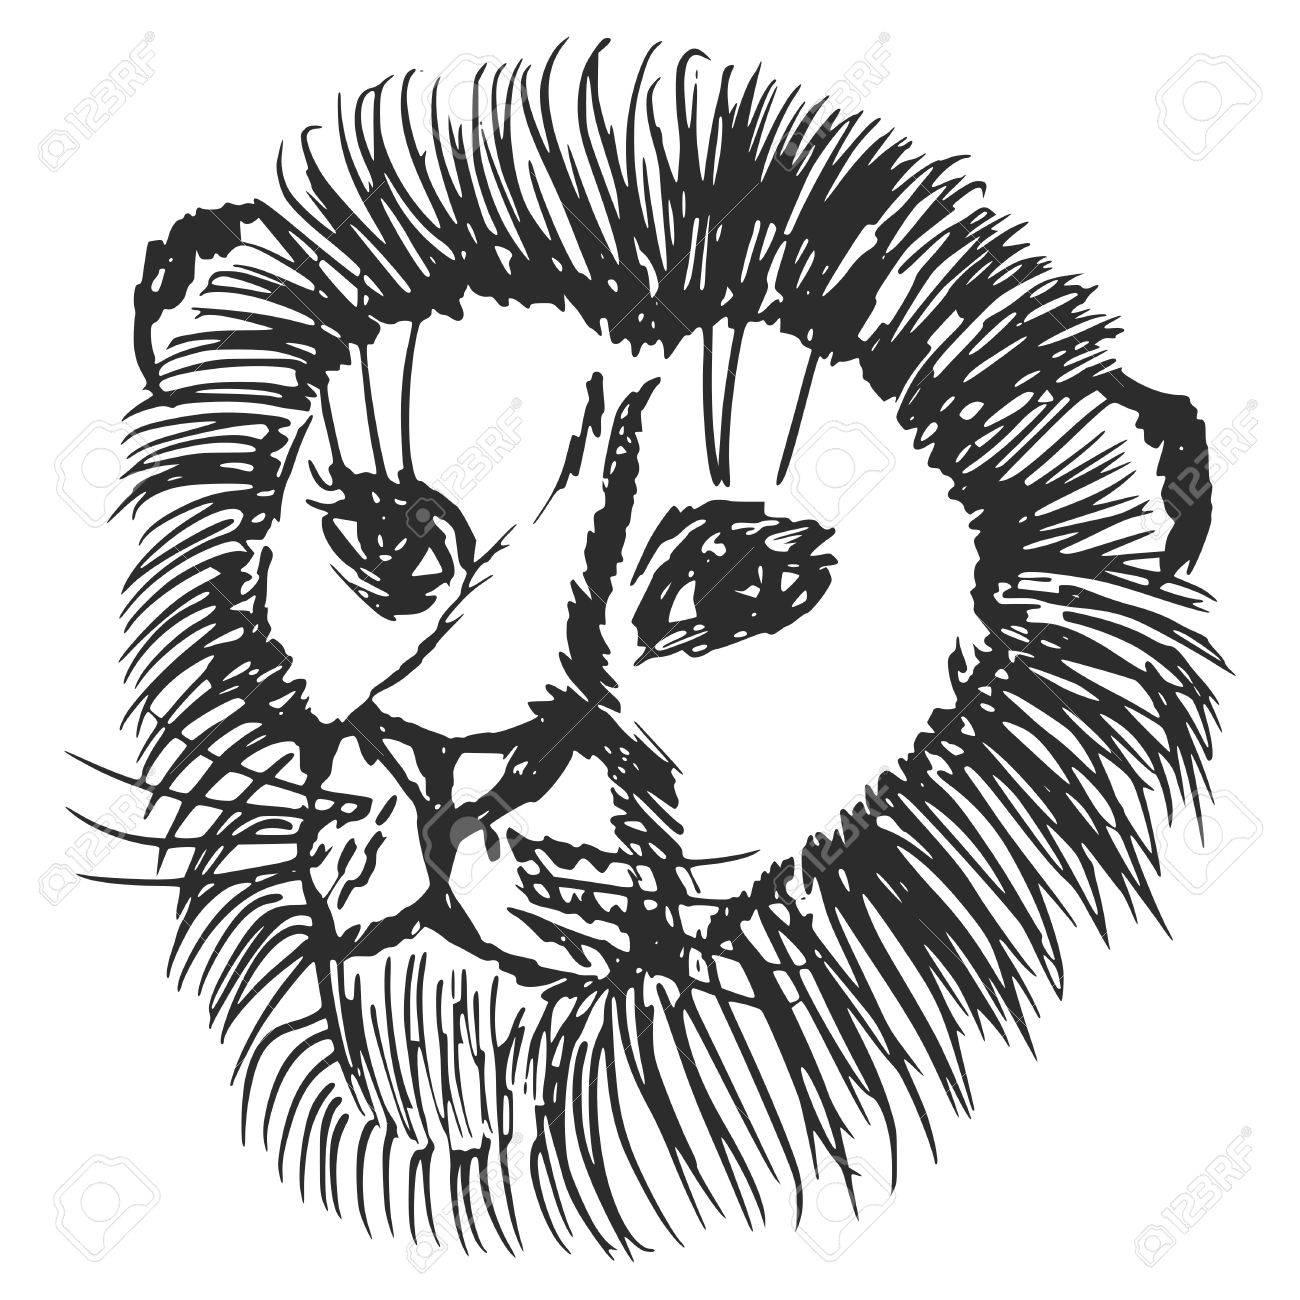 1300x1300 Hand Drawn, Sketch, Cartoon Illustration Of Lion Royalty Free